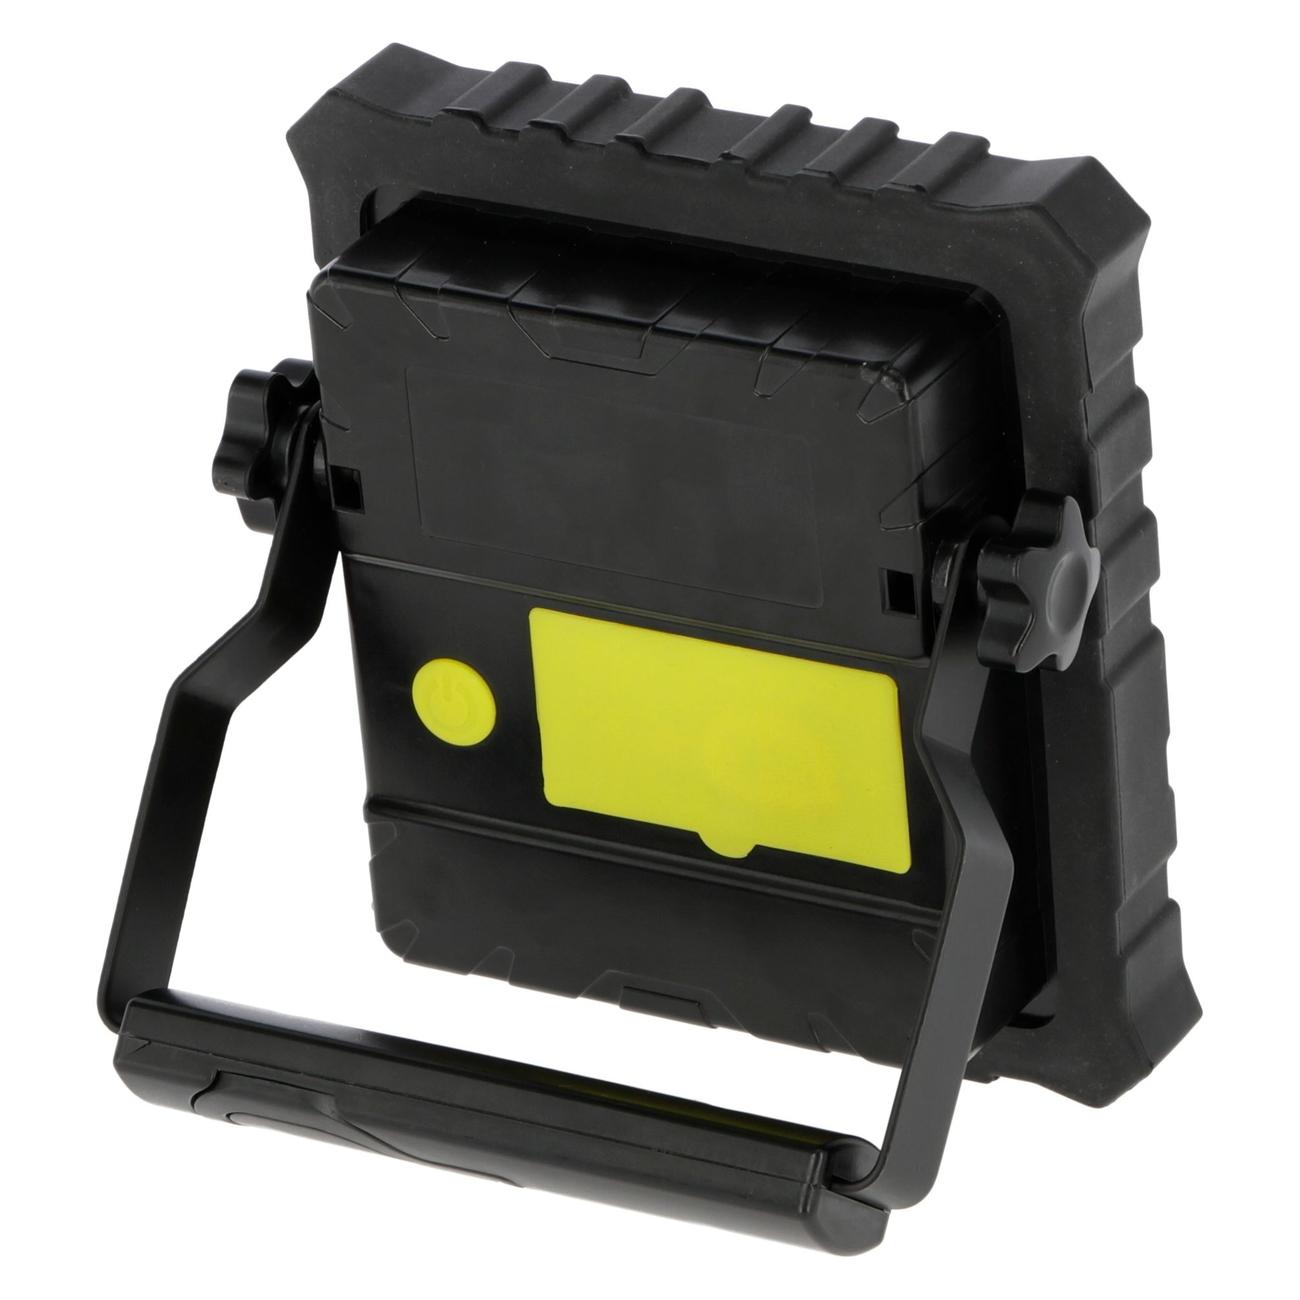 Kerbl Mobiler LED Akku Strahler WorkFire Pro, Bild 5